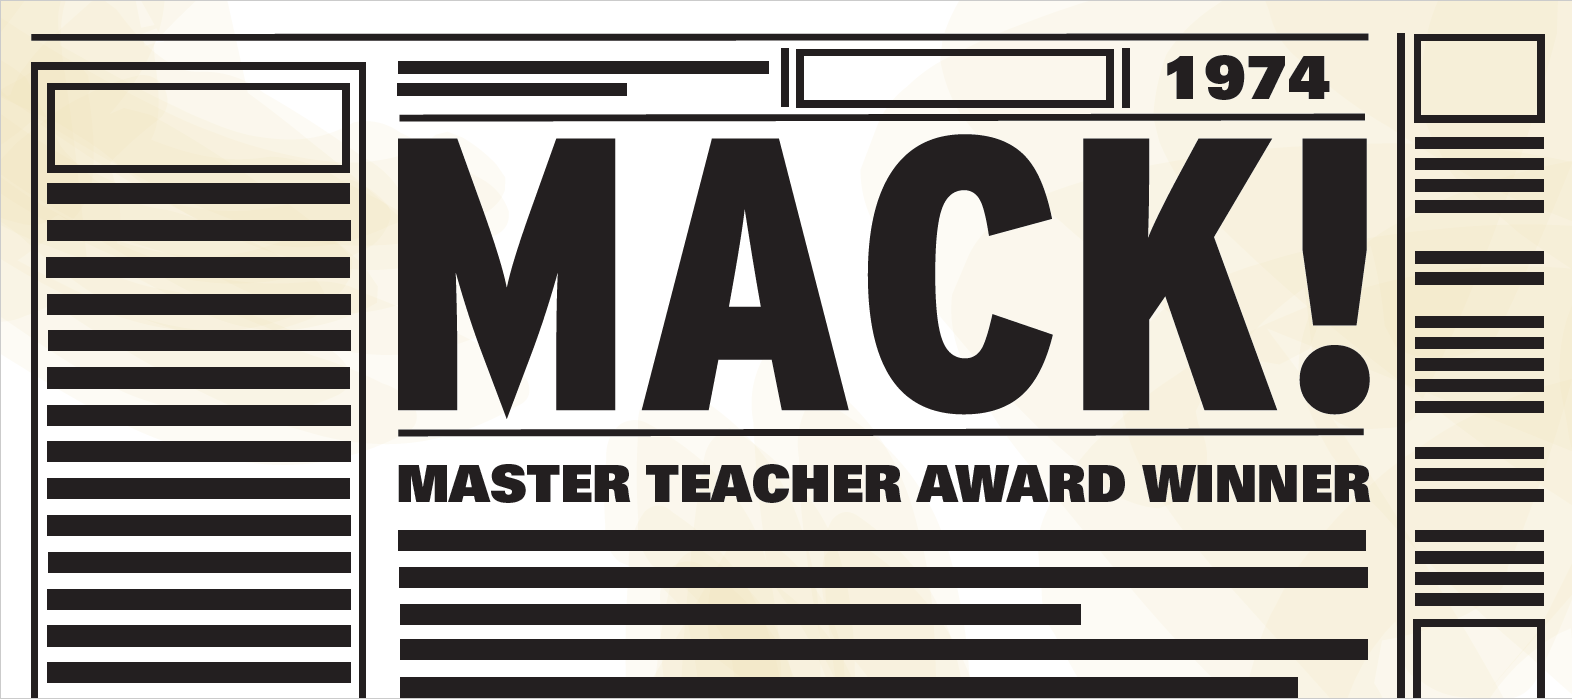 Mack sign